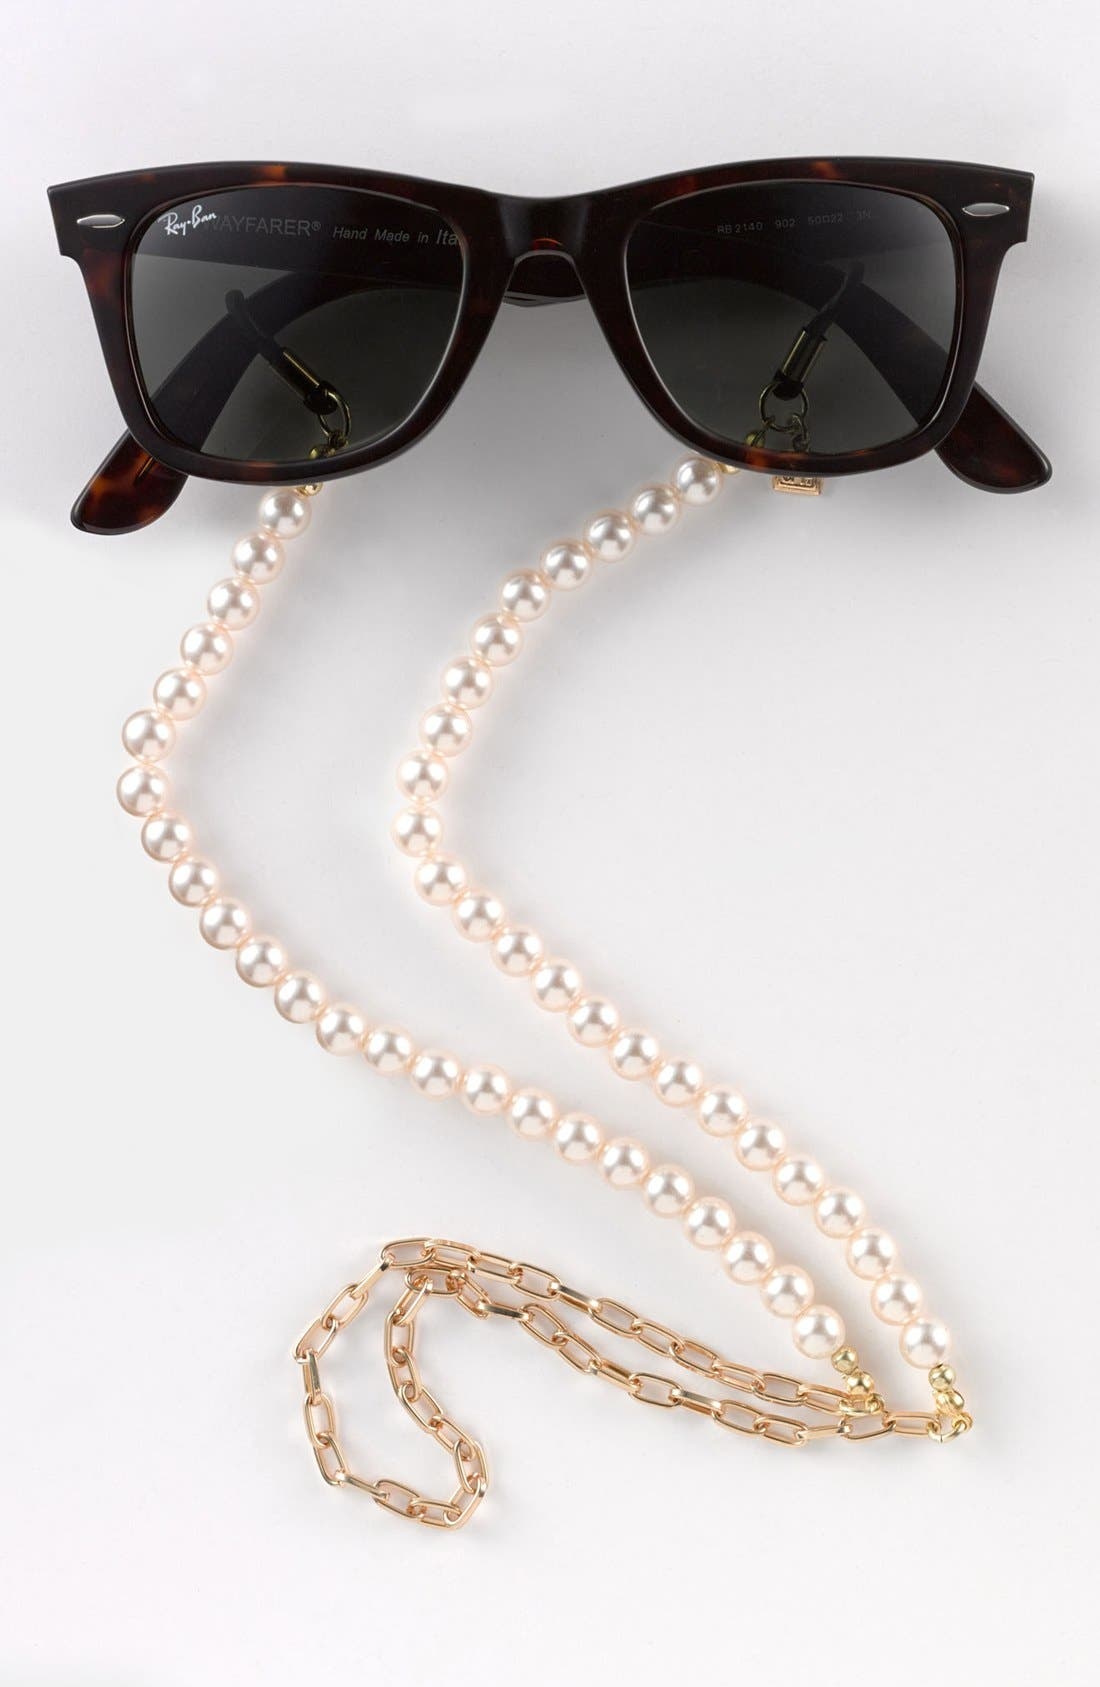 'Pearls' Eyewear Chain,                             Alternate thumbnail 2, color,                             900